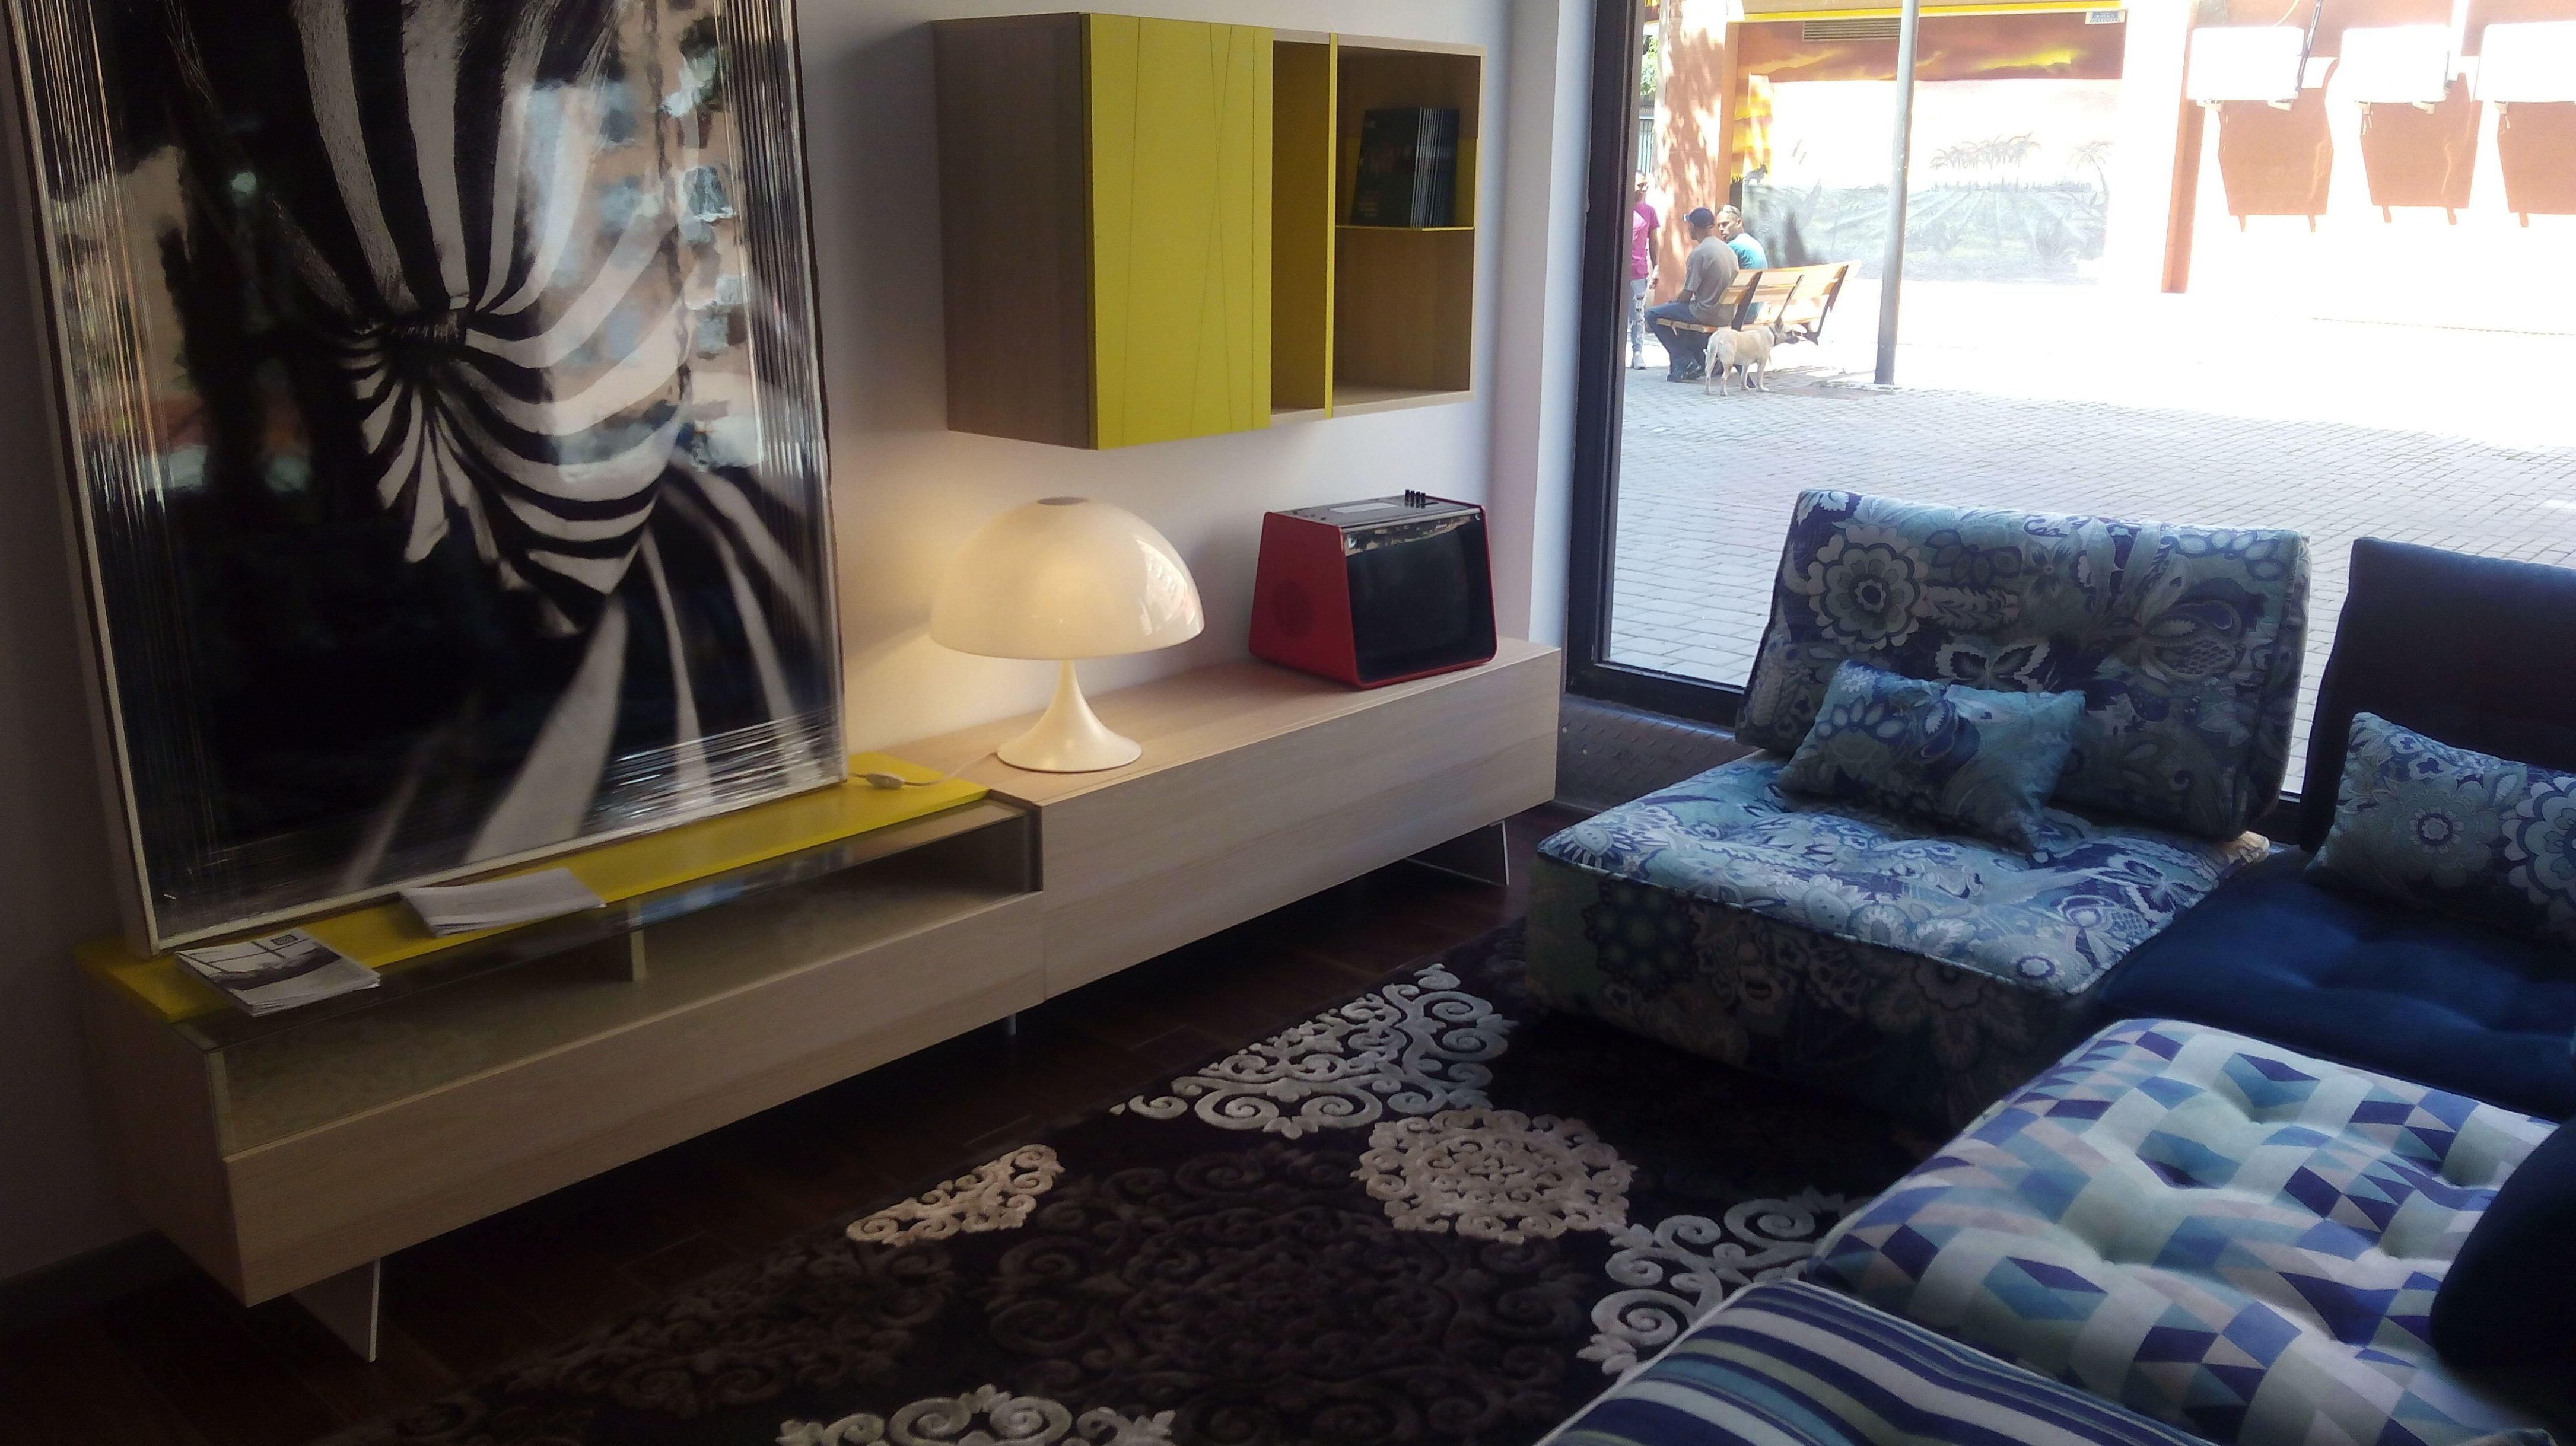 Foto 136 de Muebles en Getafe | Goga Muebles & Complementos